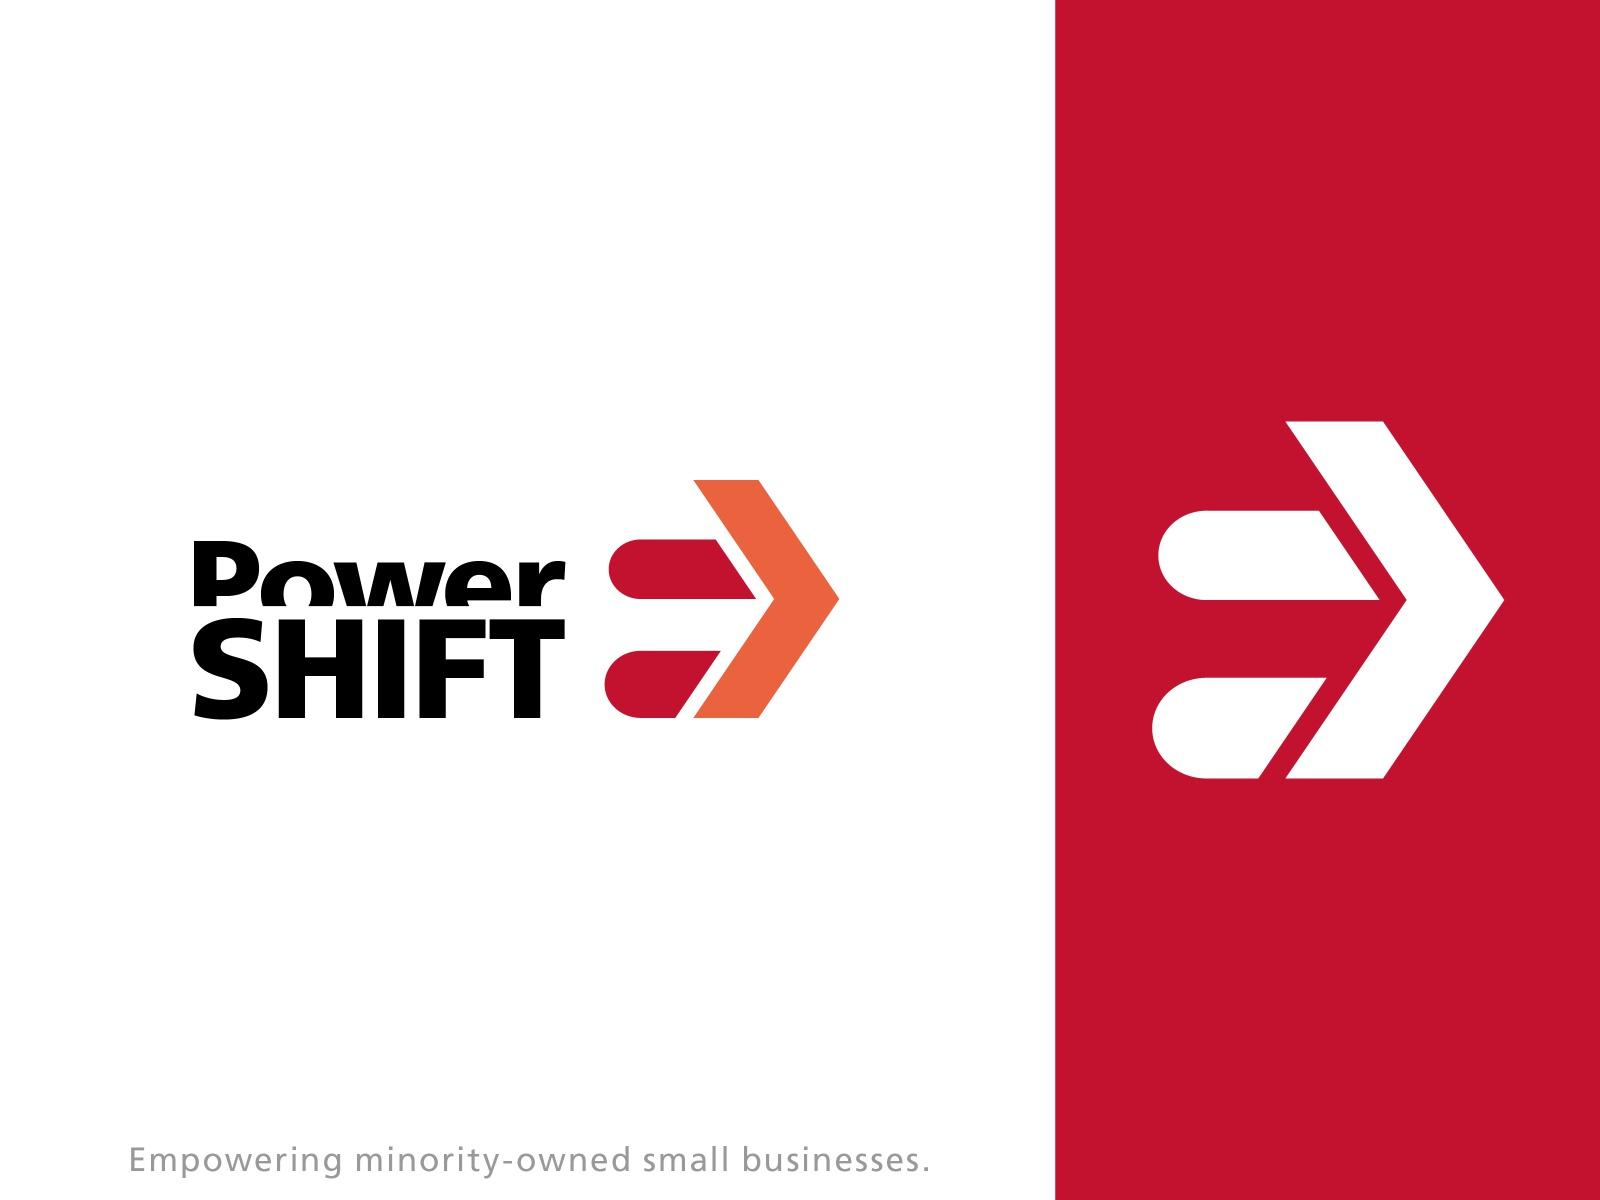 PowerShift Concept